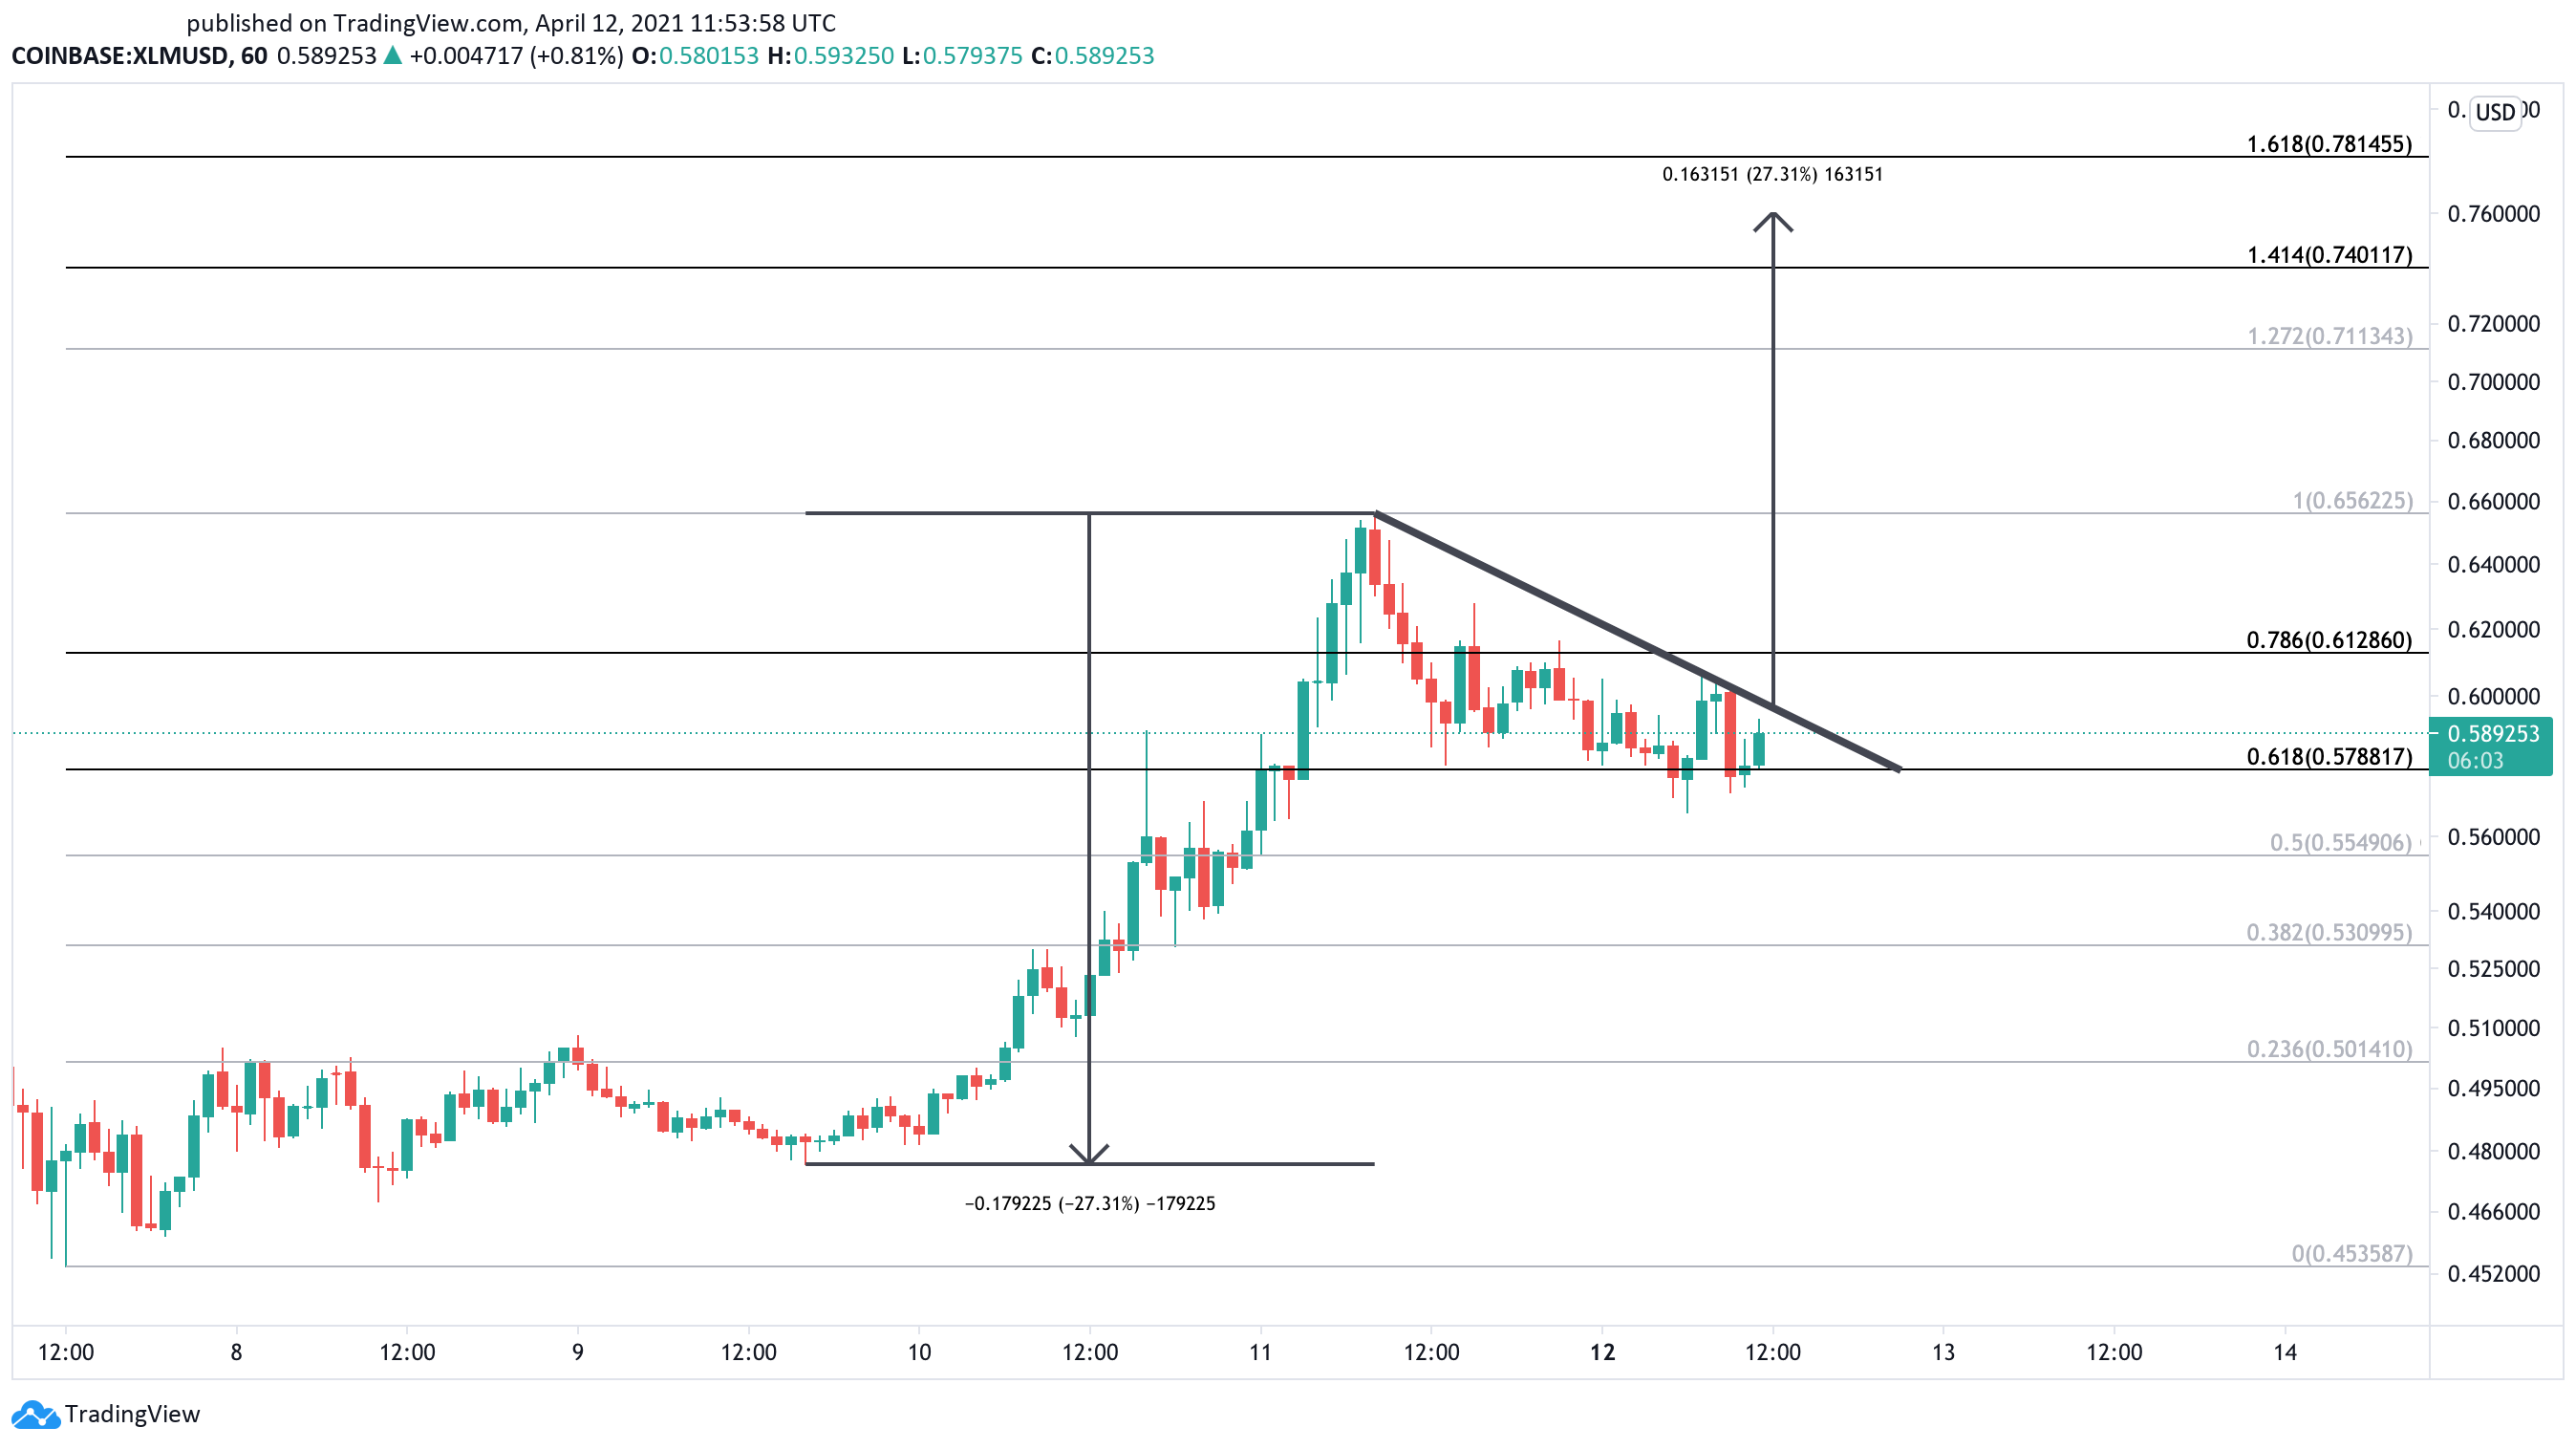 Stellar US dollar price chart